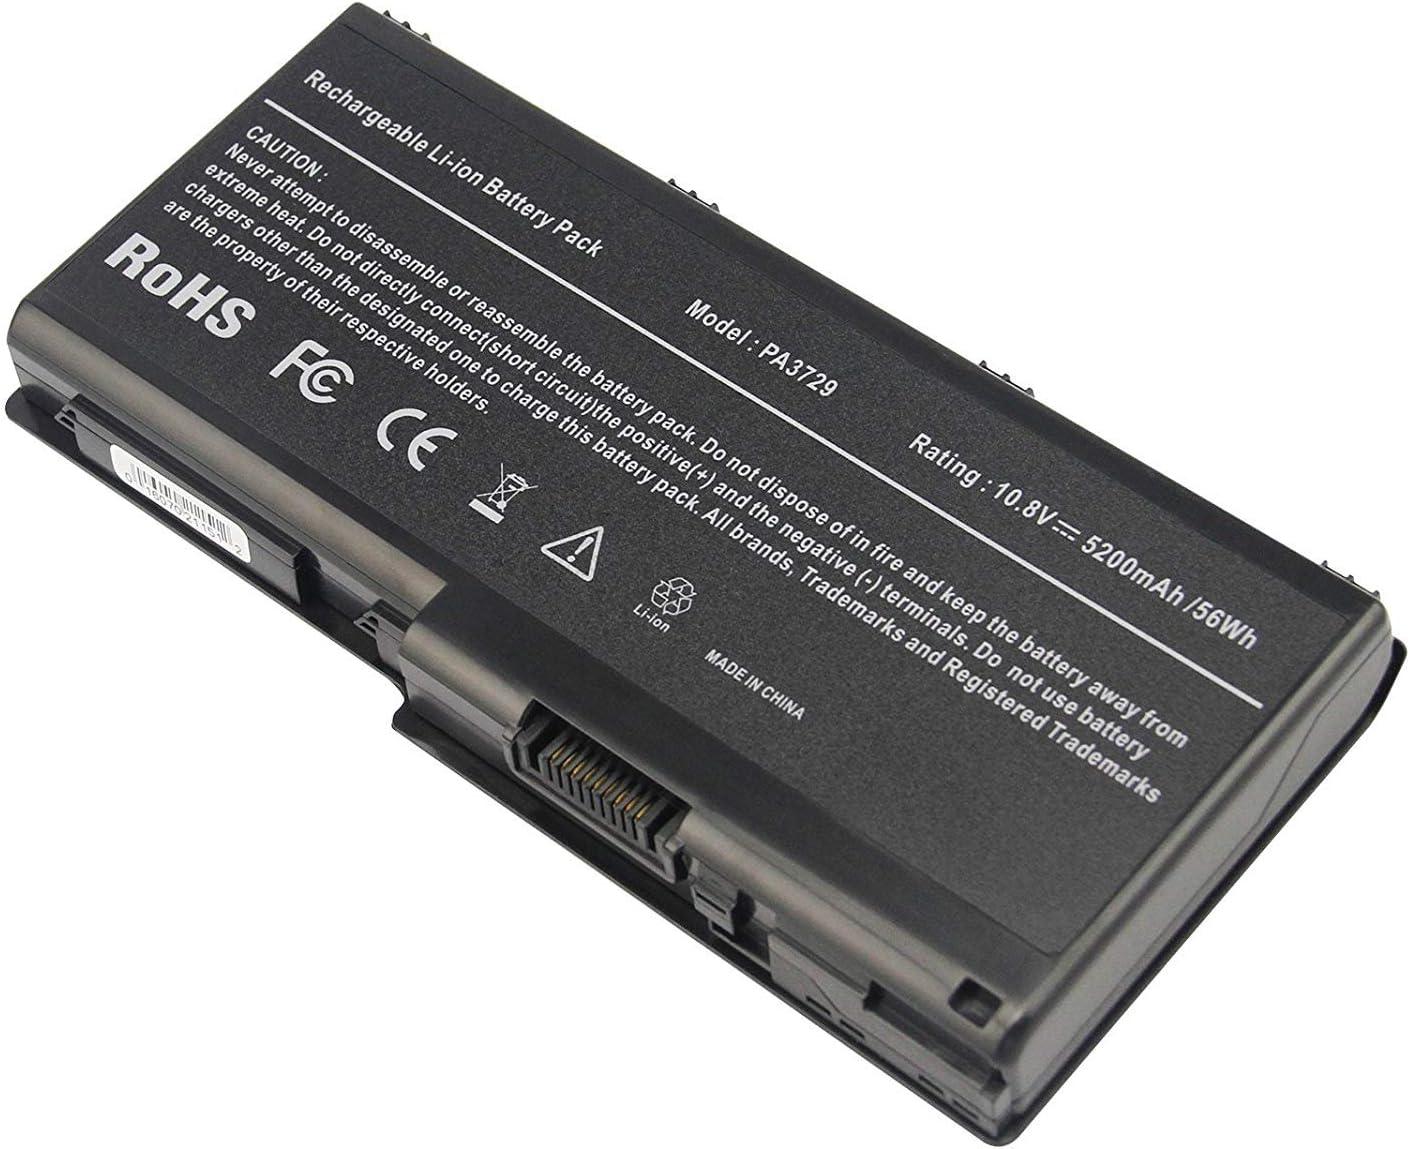 Laptop Battery for Toshiba Qosmio X500 X505 Satellite P500 P505 Series PN: PA3729U-1BAS PA3729U-1BRS PABAS207, 5200mAh/6-Cells